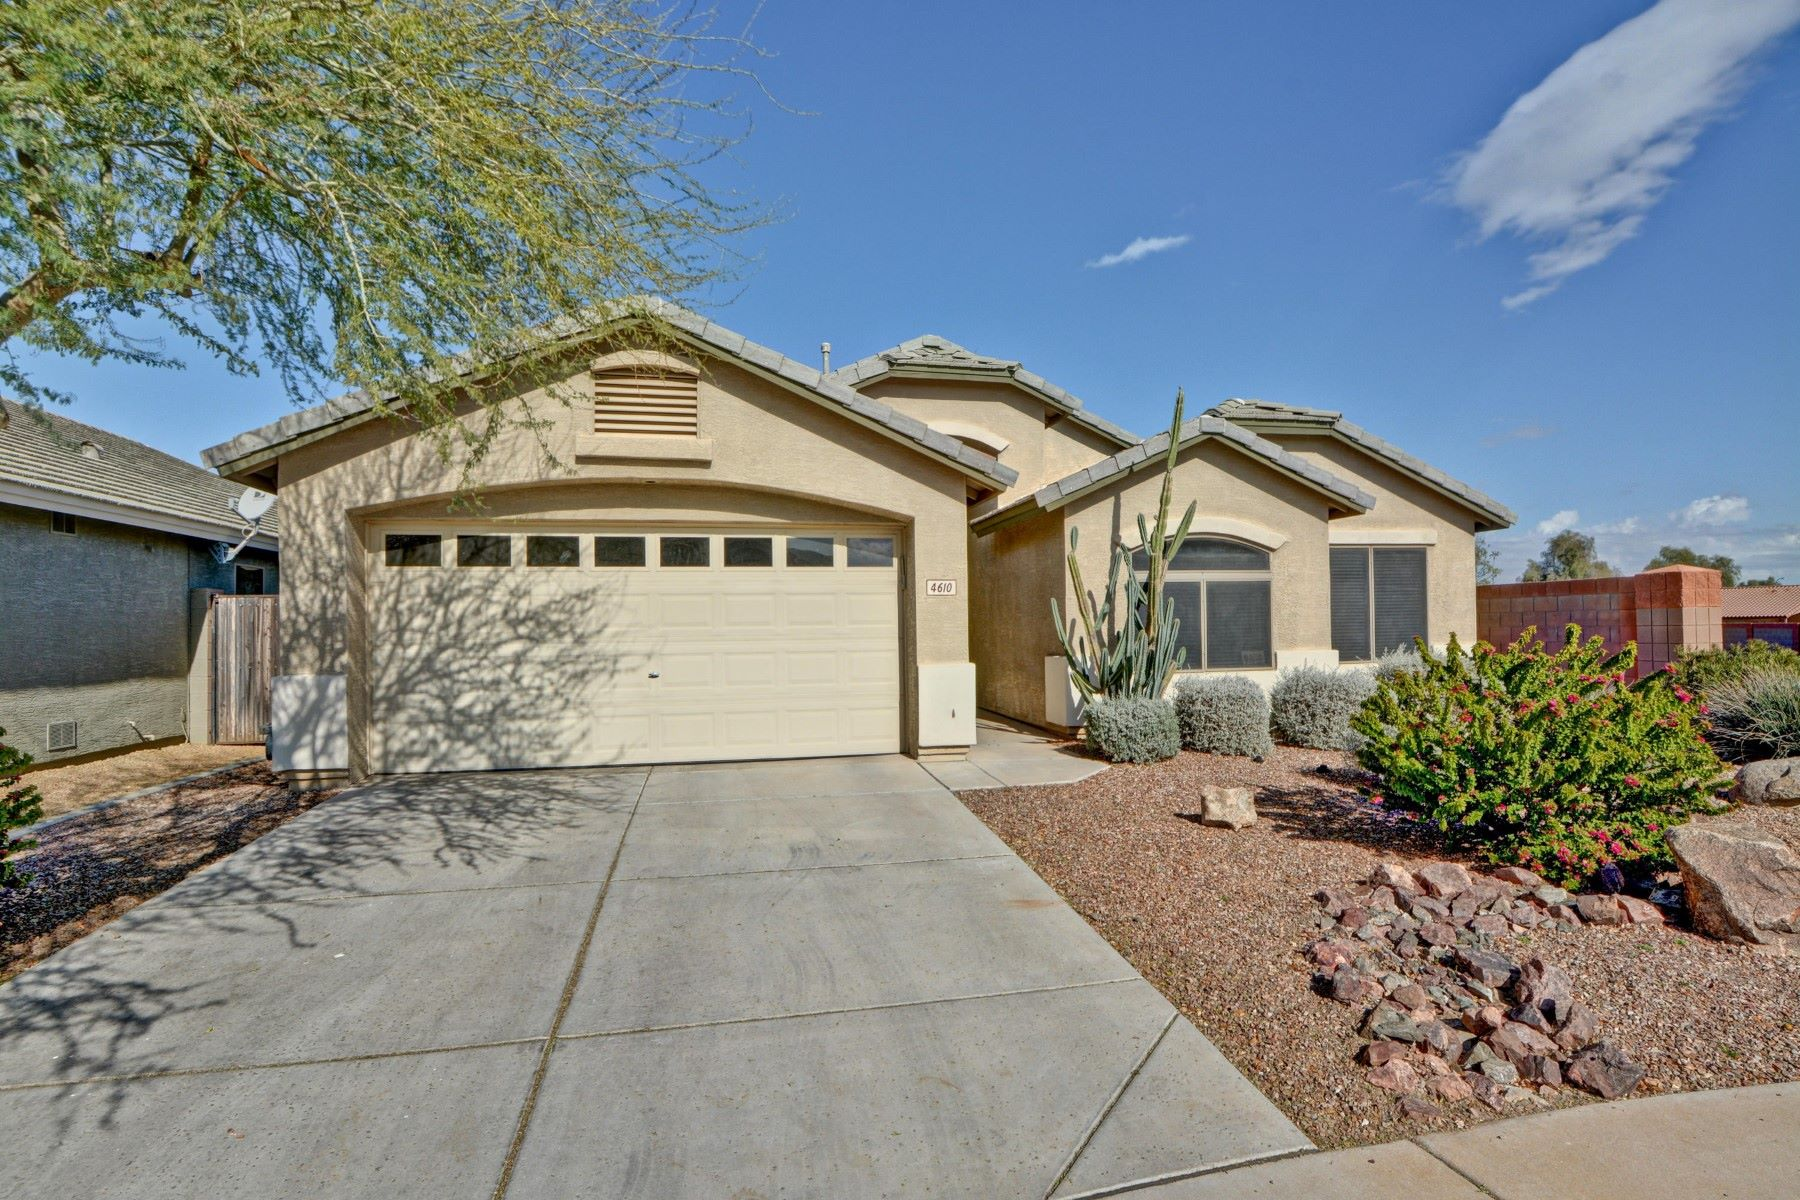 Single Family Homes for Active at 4610 ALICIA, Laveen, AZ 85339 4610 ALICIA Laveen, Arizona 85339 United States